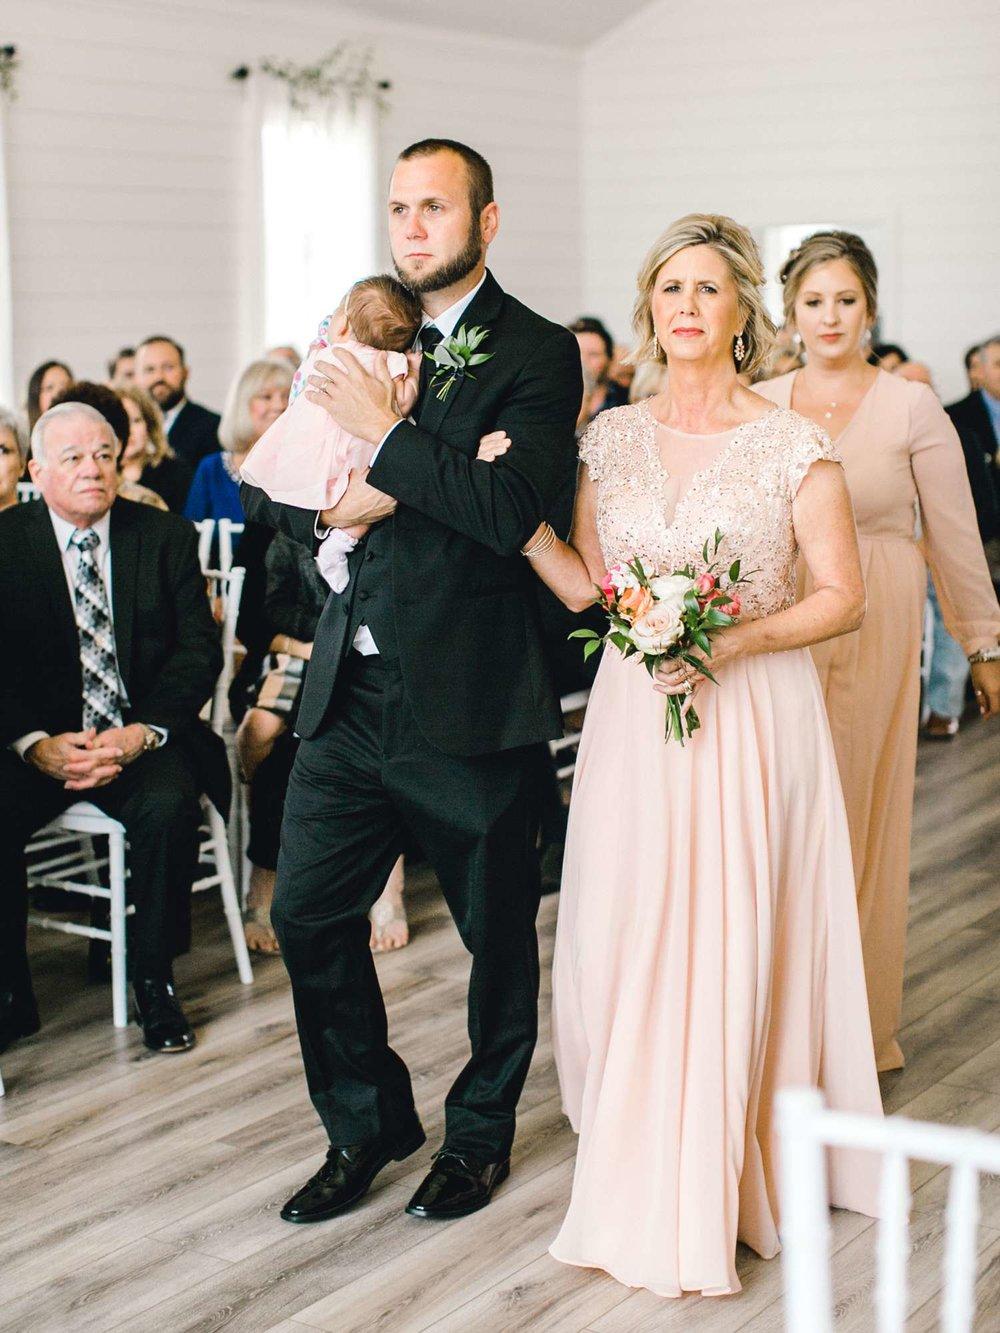 HEBERT_MORGAN_AND_CLAY_ALLEEJ_THE_FARMHOUSE_MONTGOMERY_TEXAS_WEDDING_0076.jpg